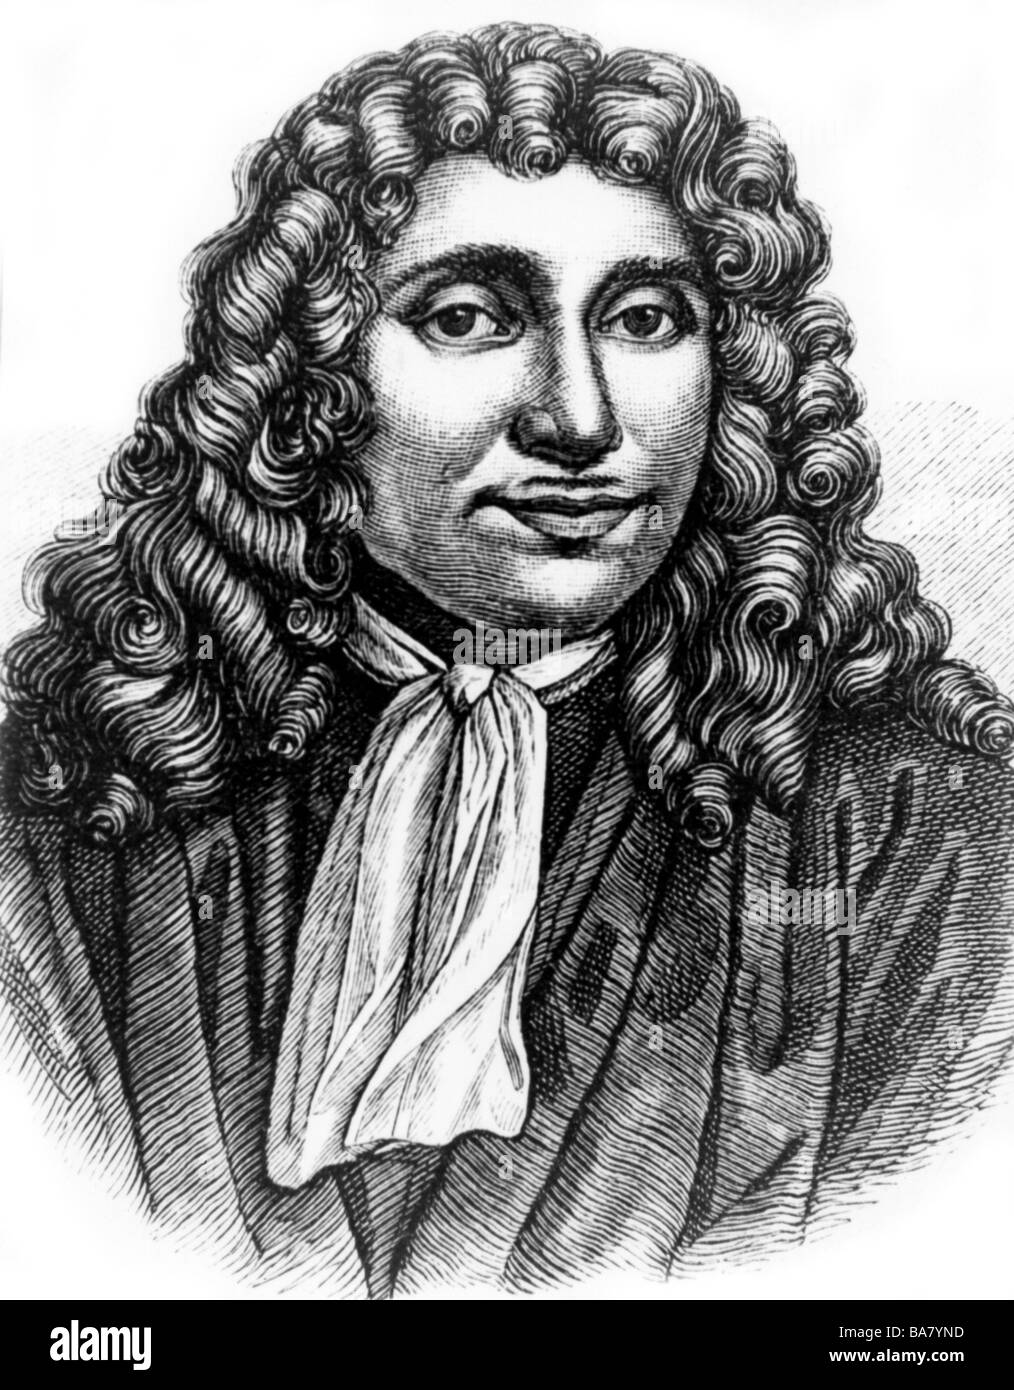 17 Jahrhundert Bild Architektur: Antonie Van Leeuwenhoek,, 24.10.1632